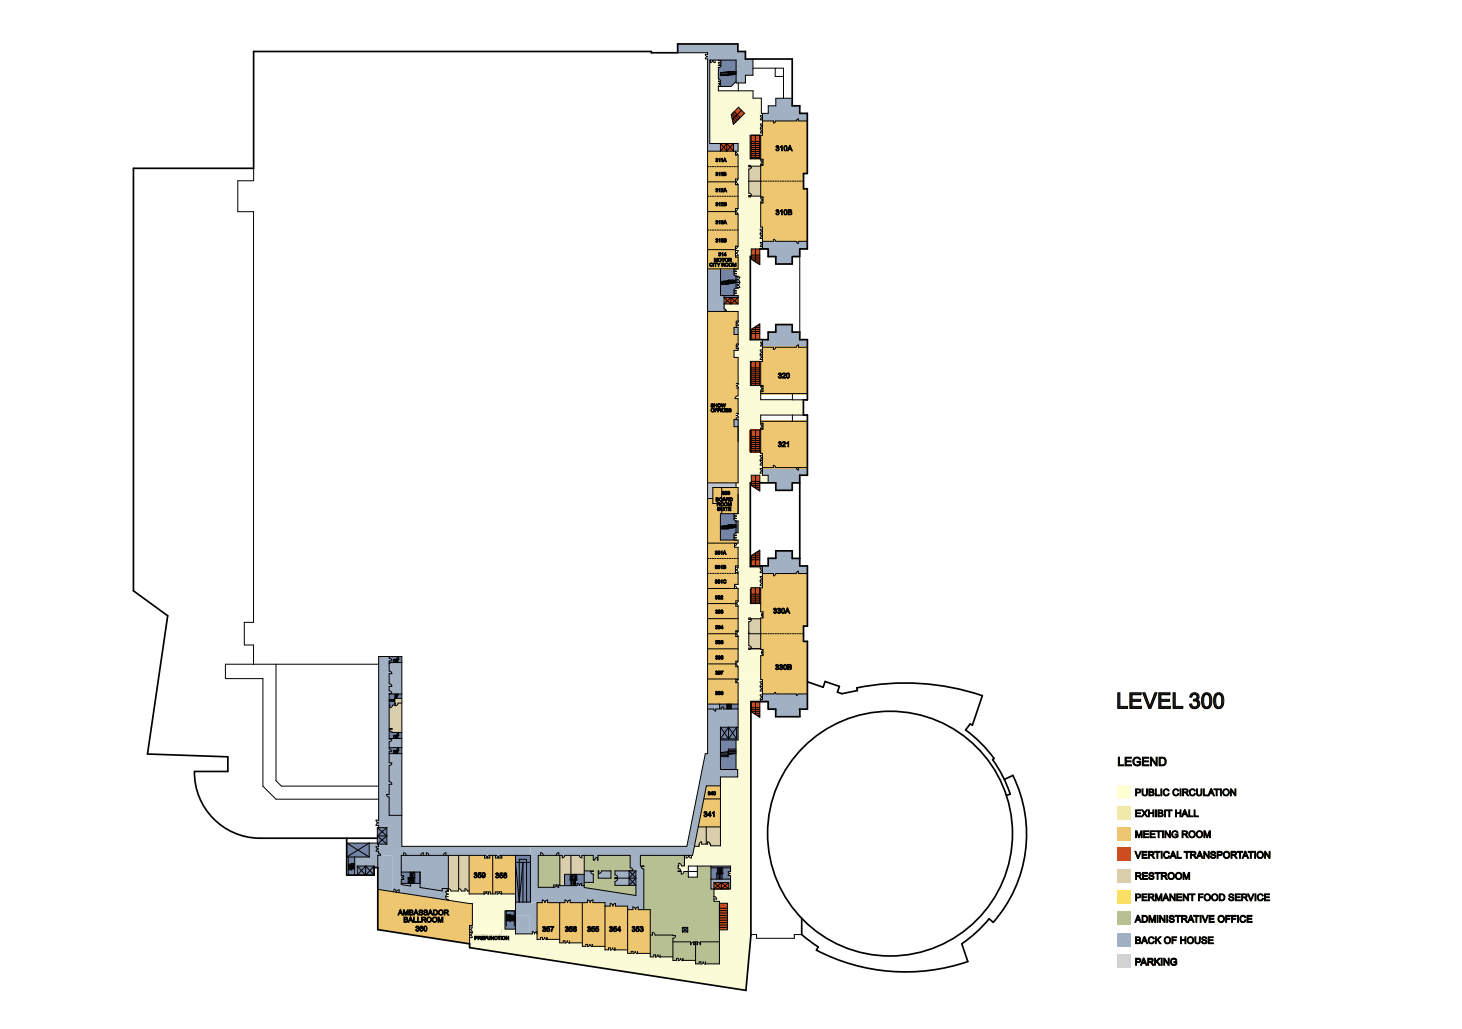 floor plans cobo center detroit michigan detailed room plans by floor level100 update png level200 update jpg level 300 update png